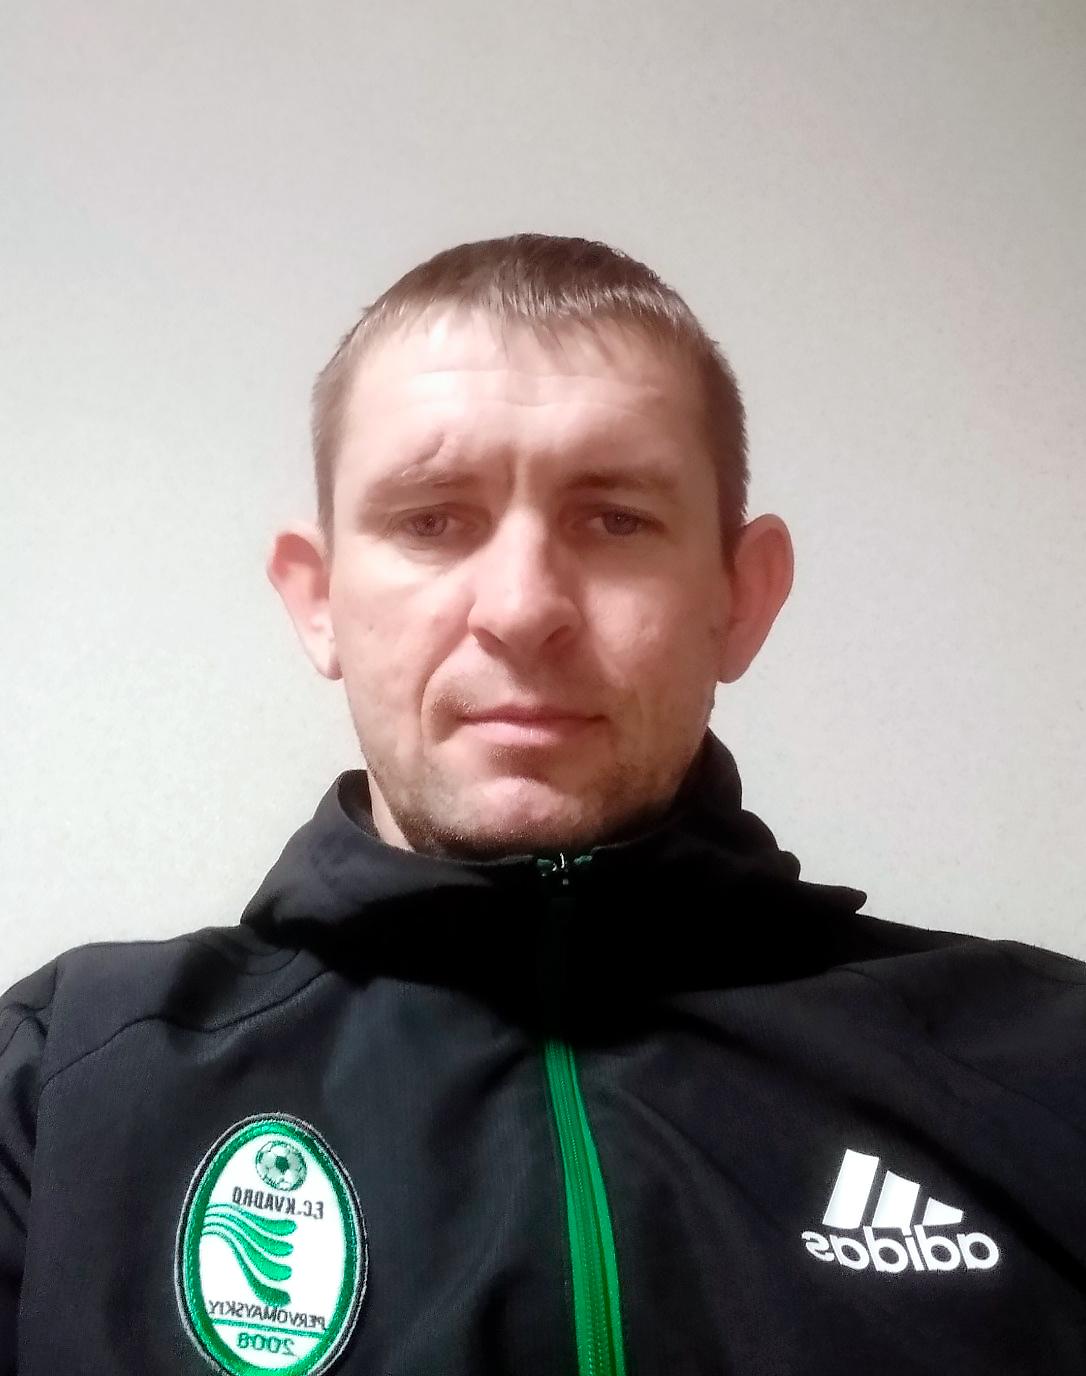 Бондарь Анатолий Михайлович